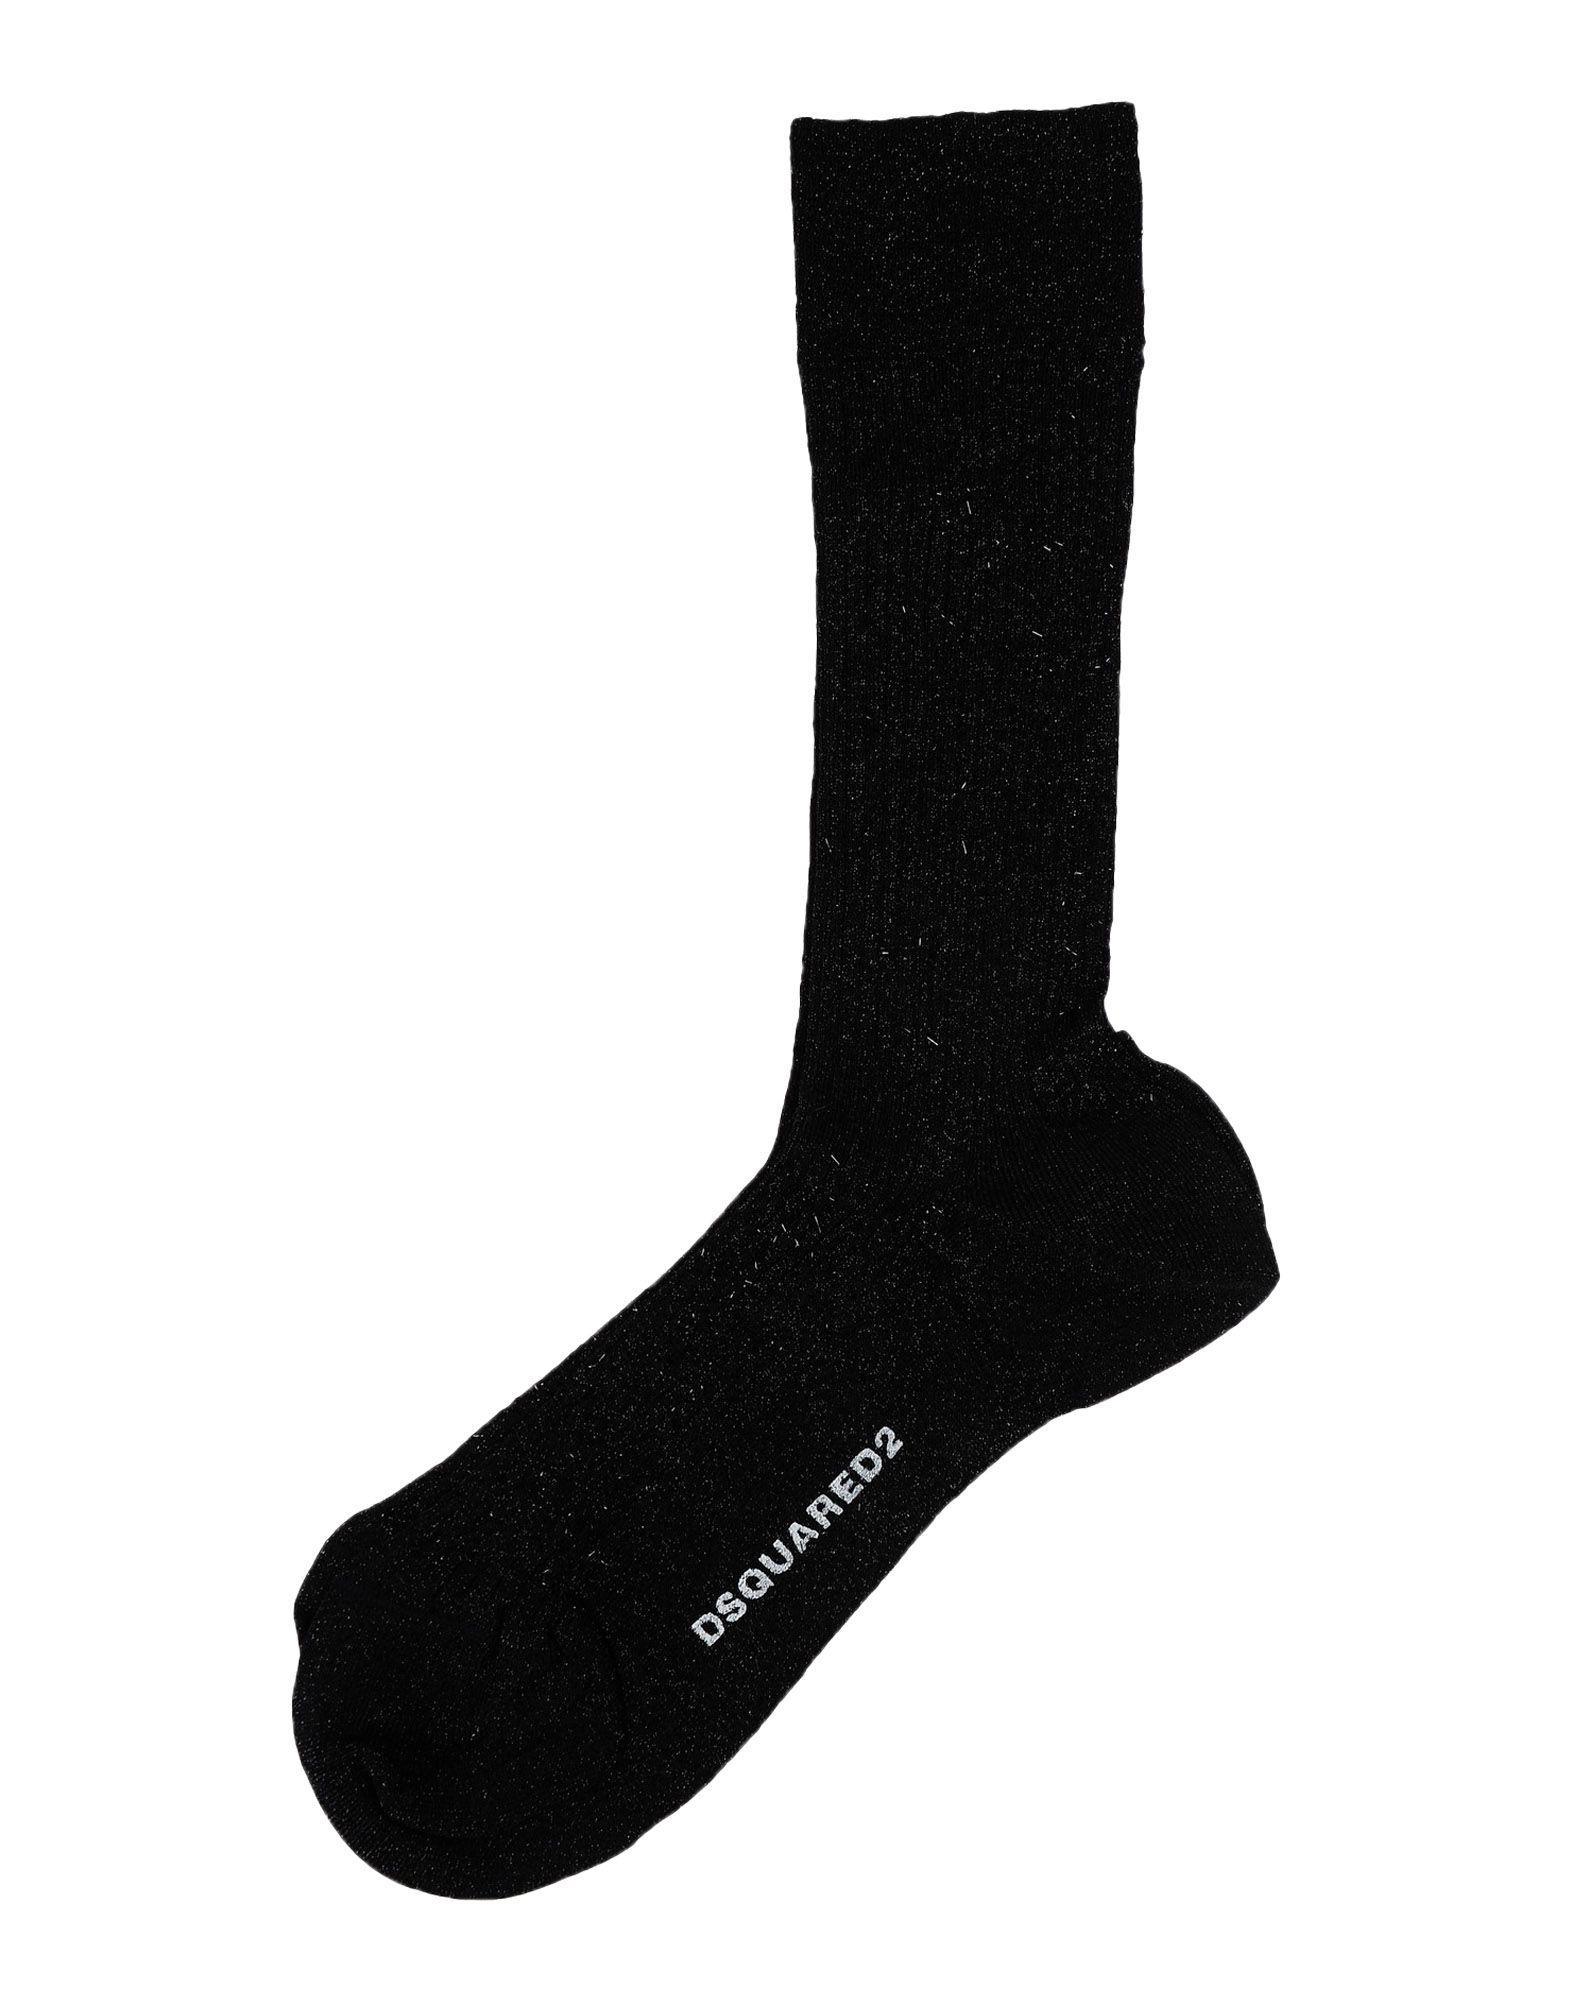 Find great deals on eBay for black short socks. Shop with confidence.